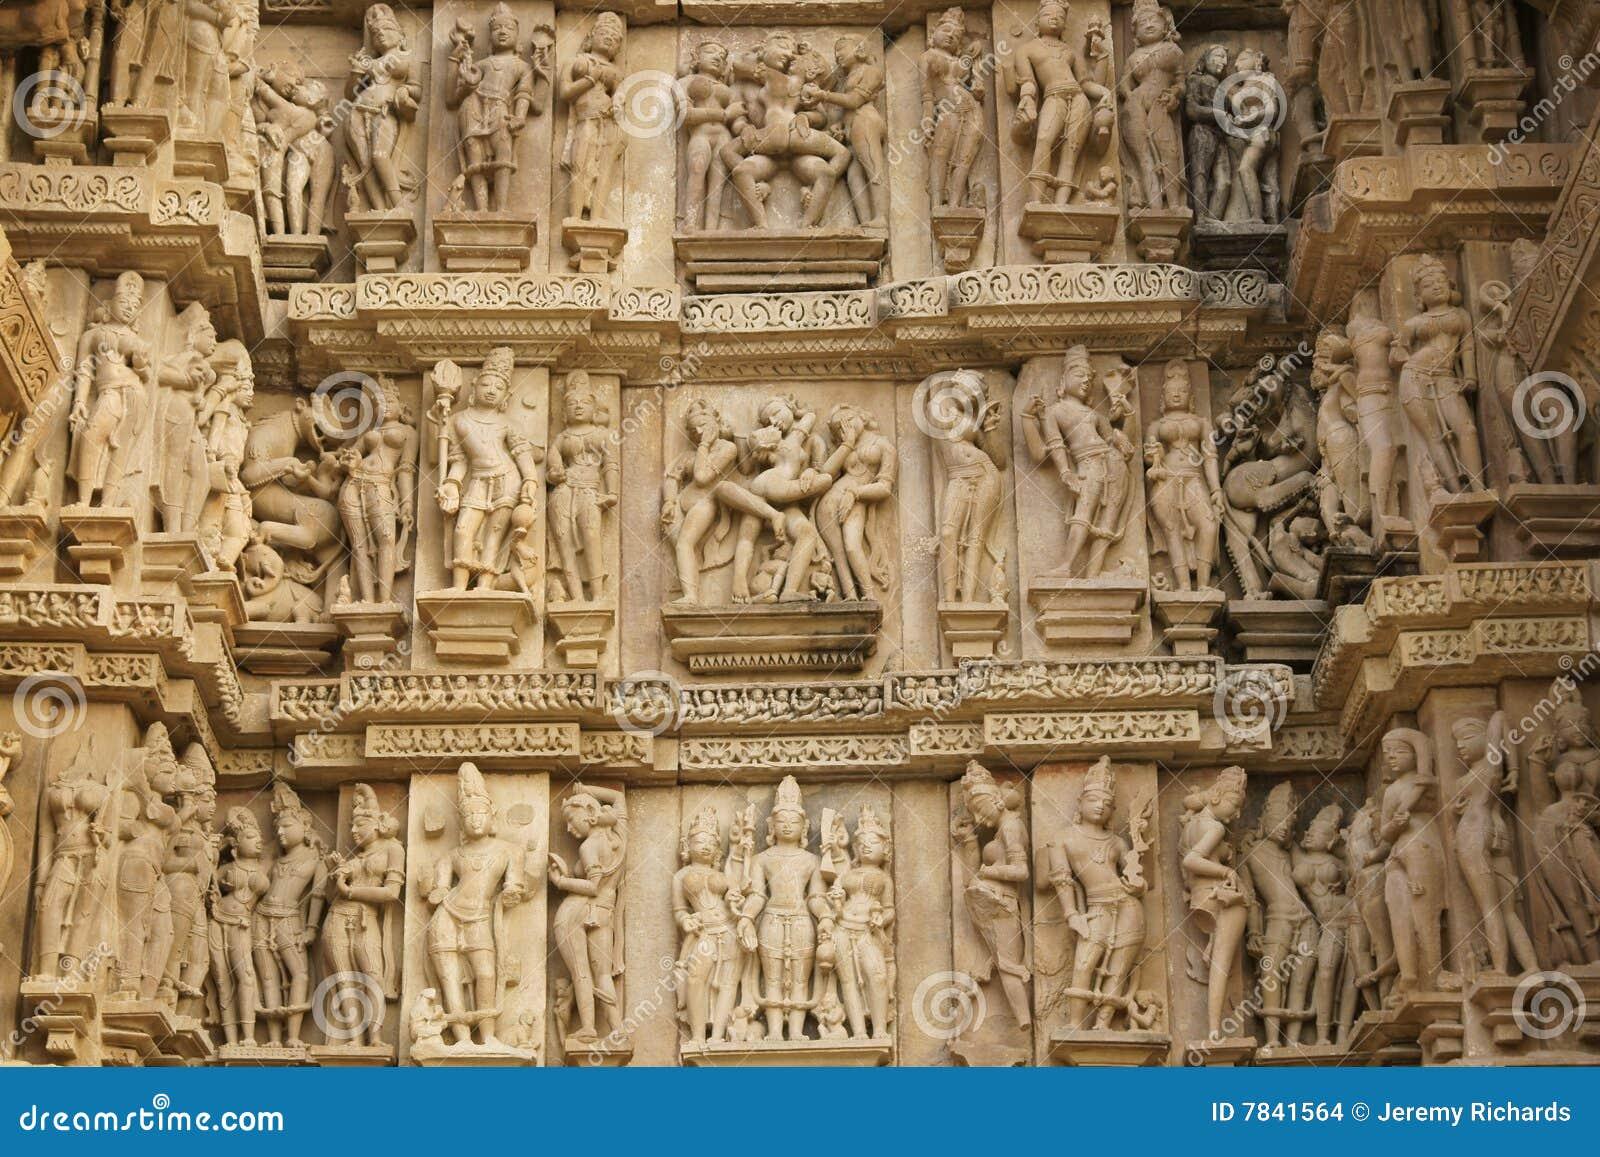 Erotic Hindu Temple Stock Images - Image 7841564-2866